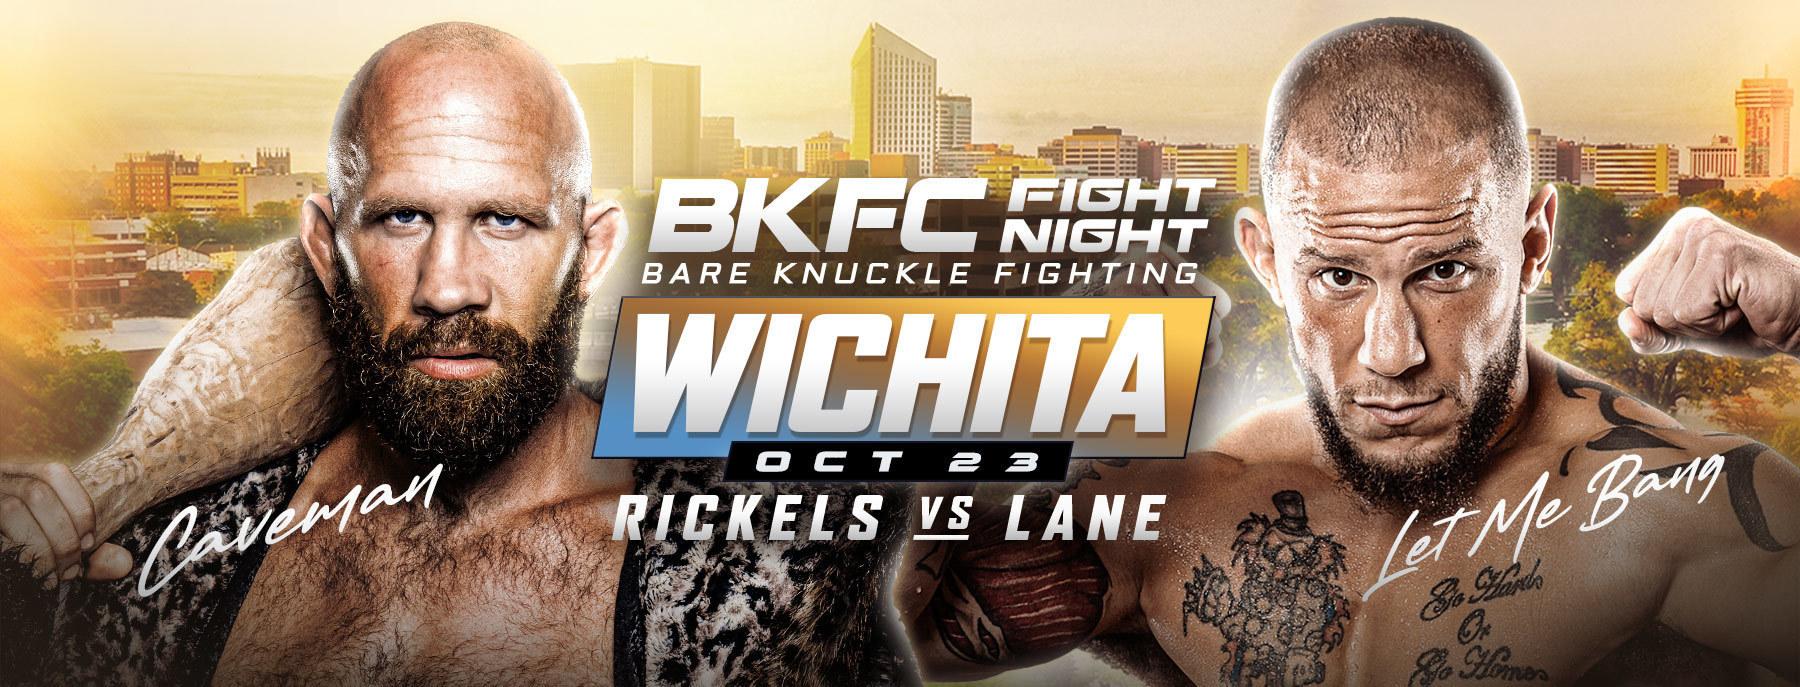 BKFC Fight Night WICHITA